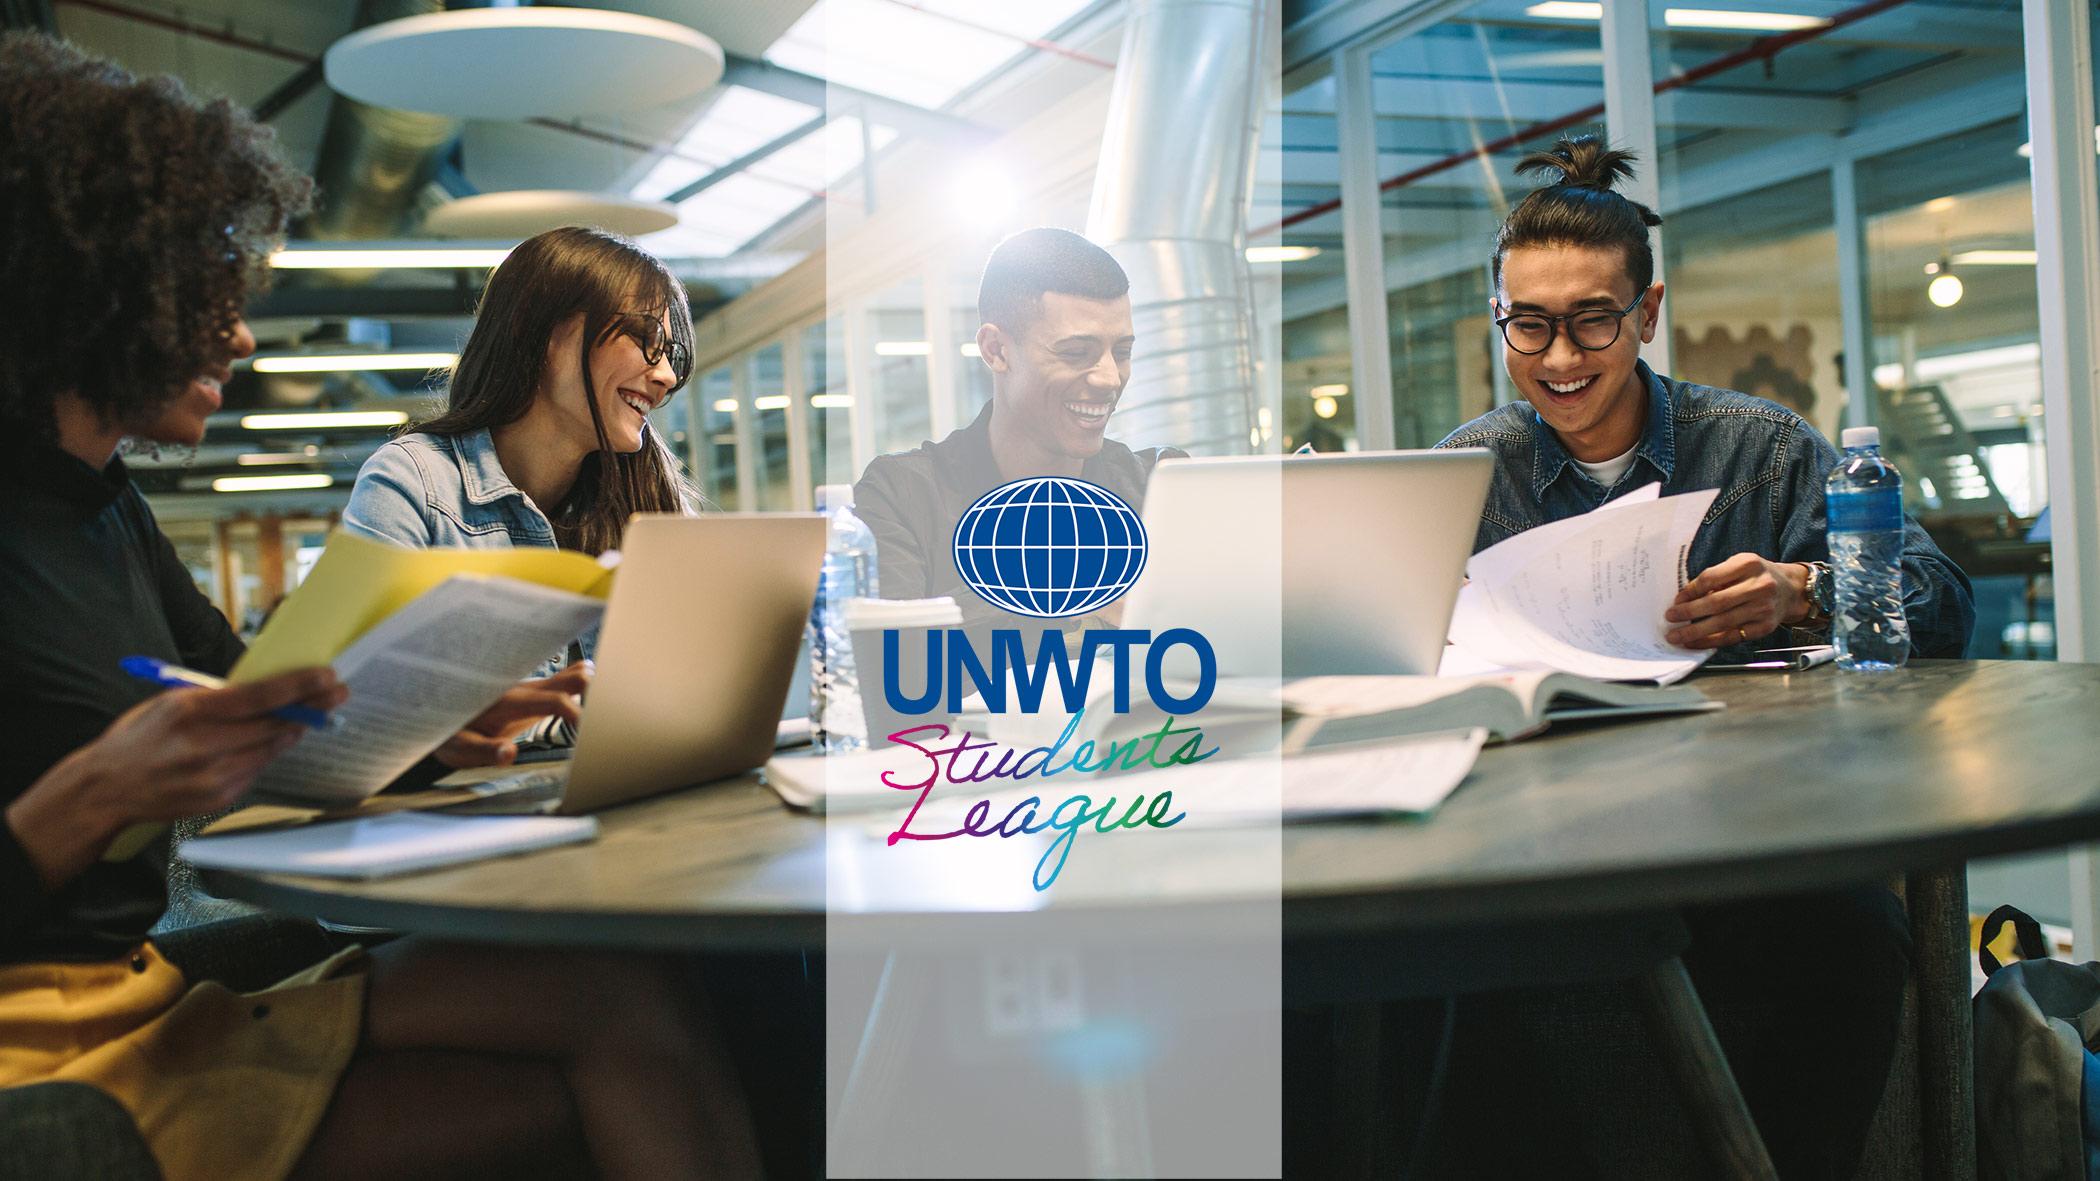 UNWTO Students' League - Methodology